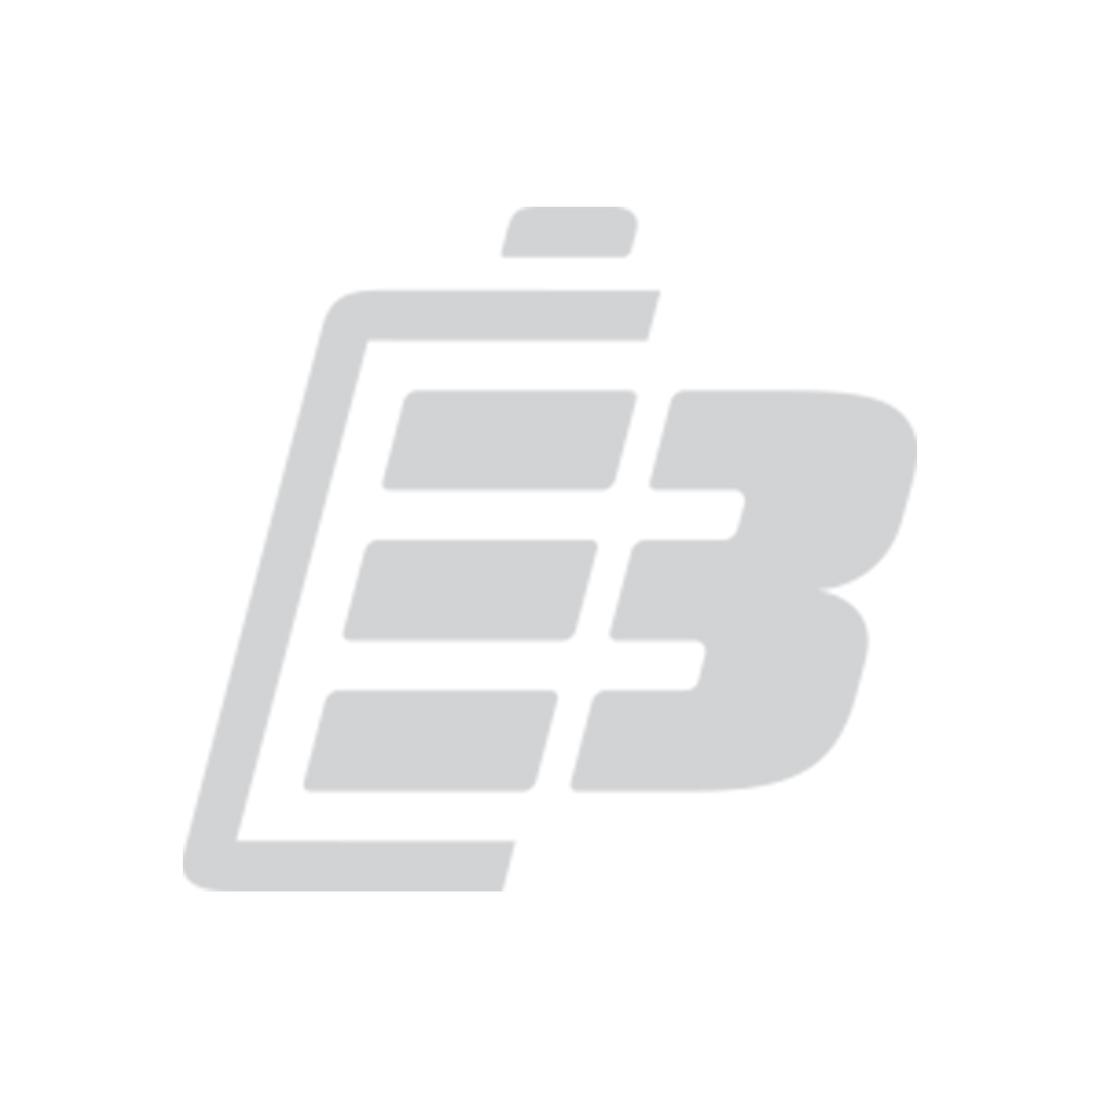 NPP Lead Acid Battery 12V 7Ah_1